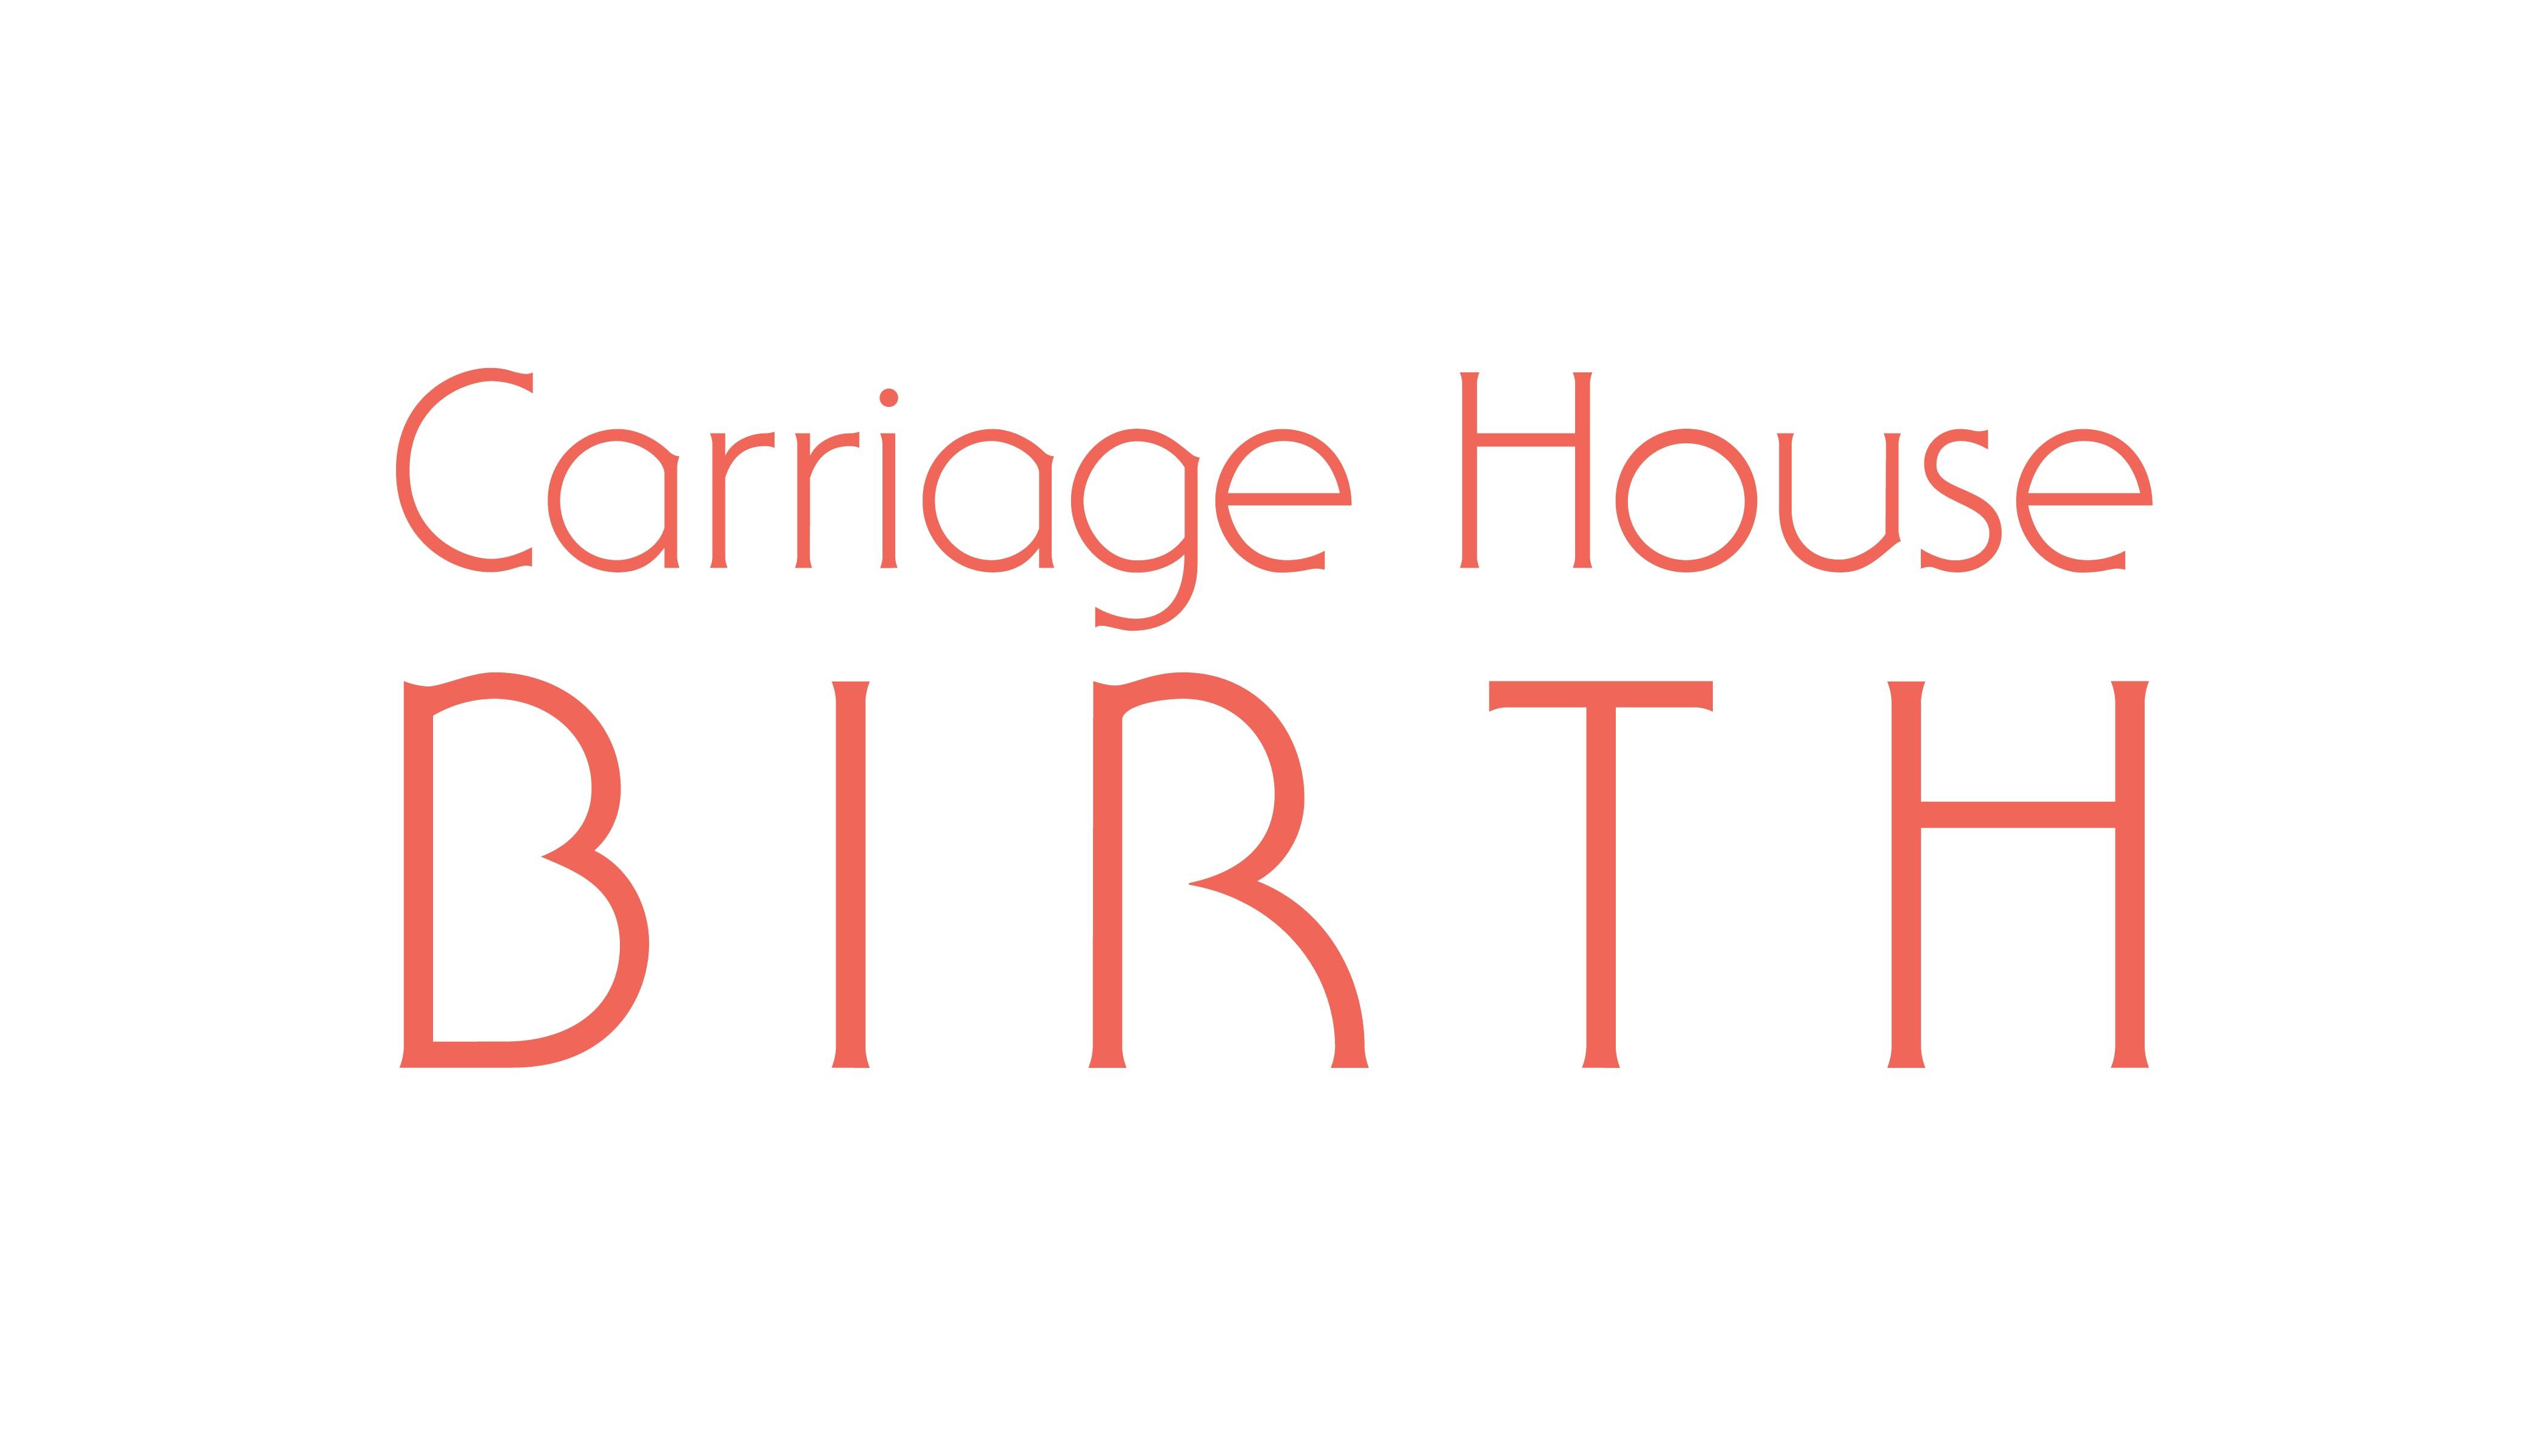 Carriage House Birth Foundation Birth Doula Training (FEBRUARY-NYC)